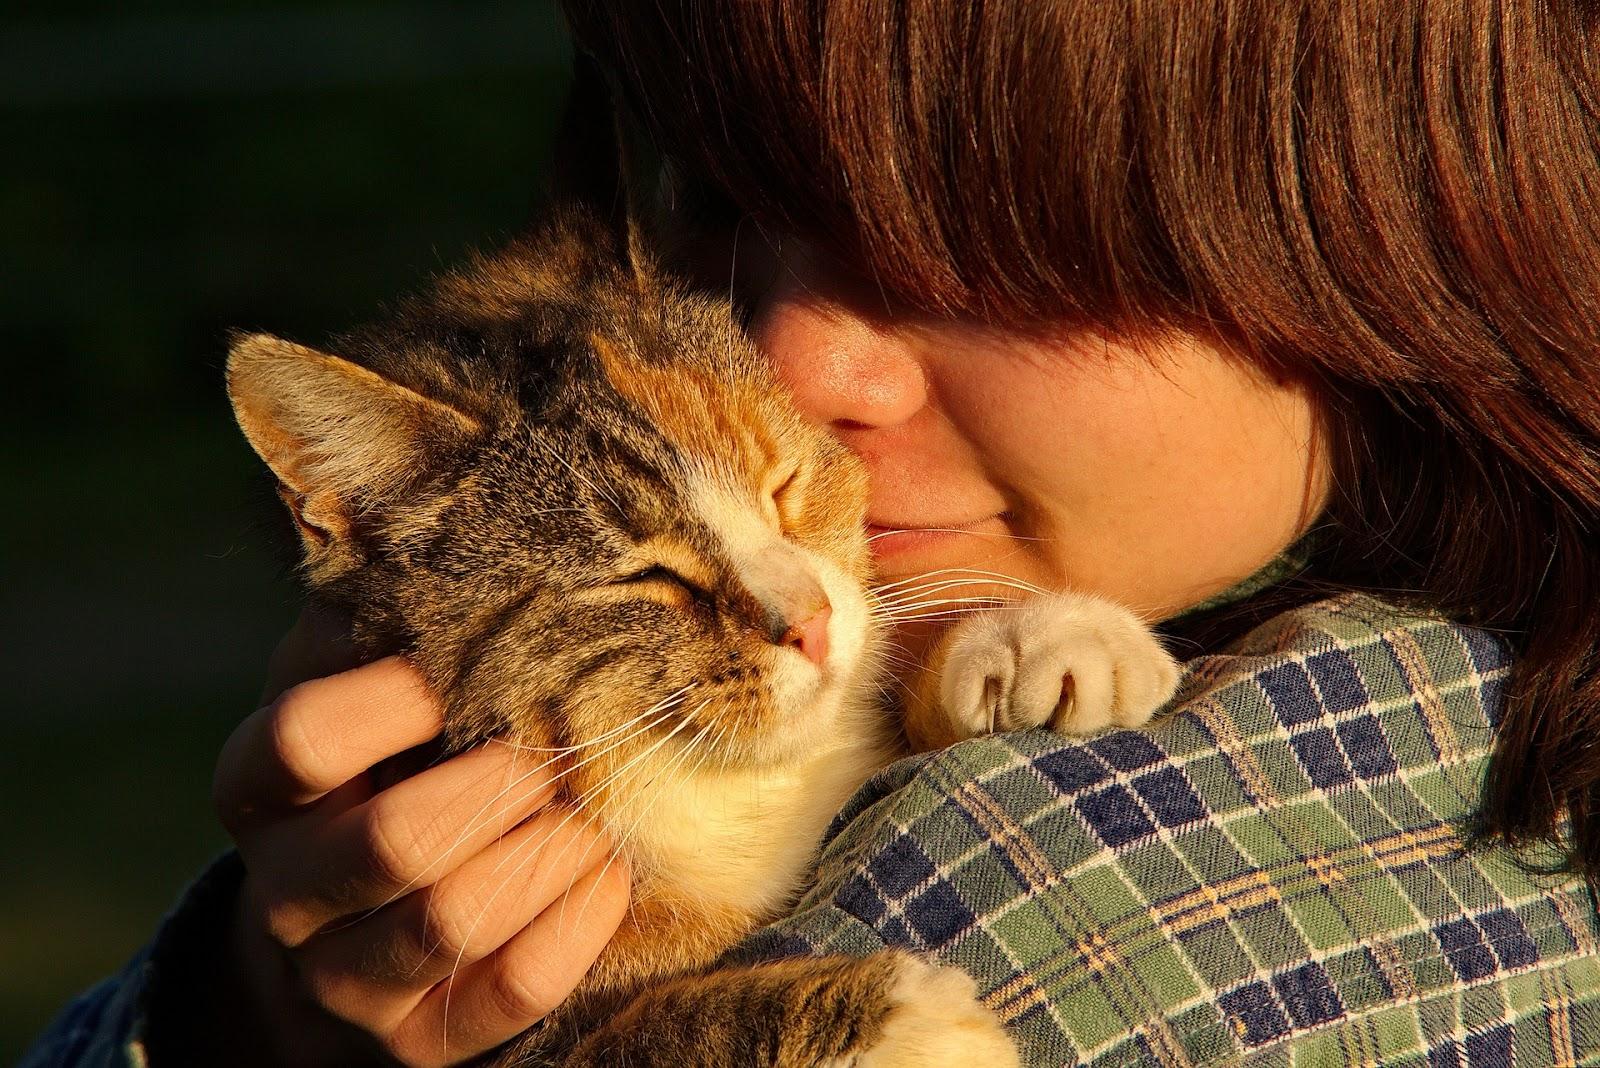 cat cuddling with child